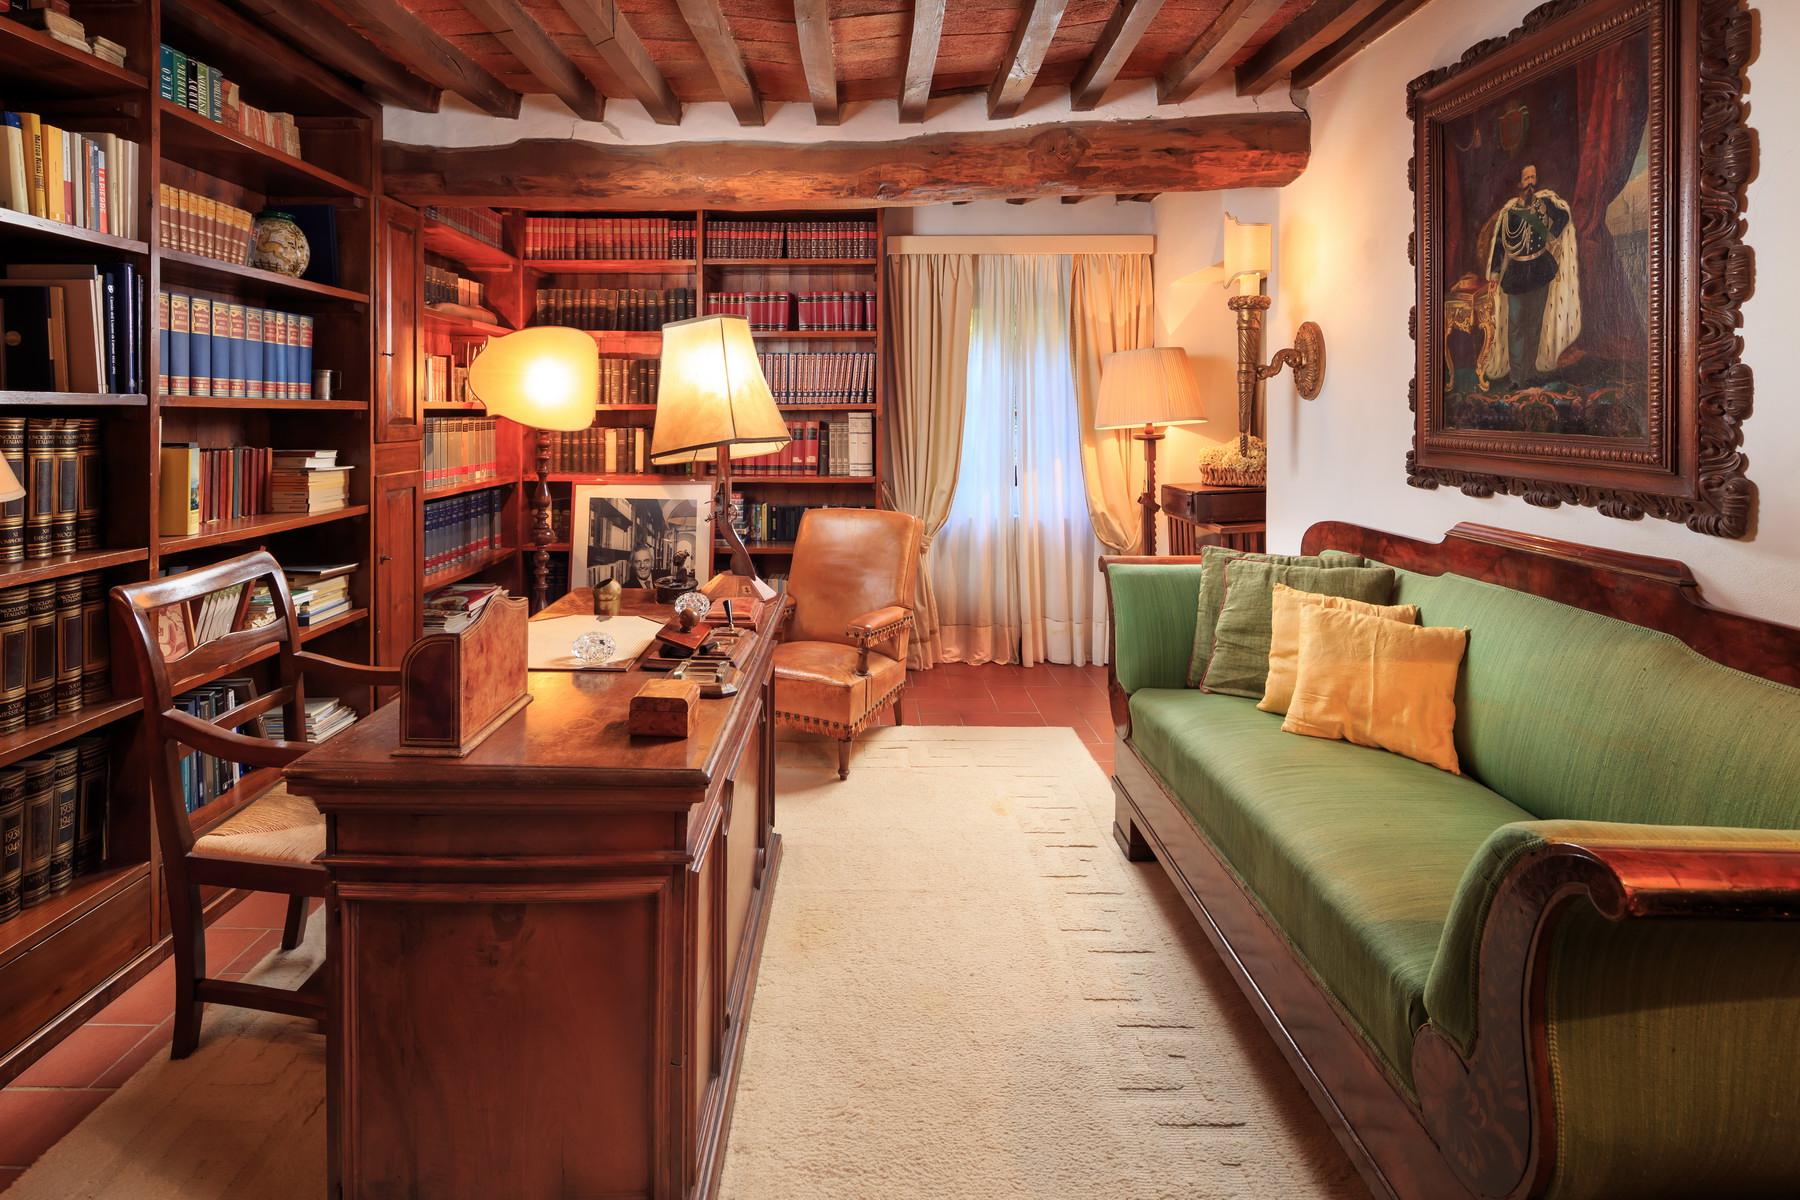 Rustico in Vendita a Castellina In Chianti: 5 locali, 720 mq - Foto 5